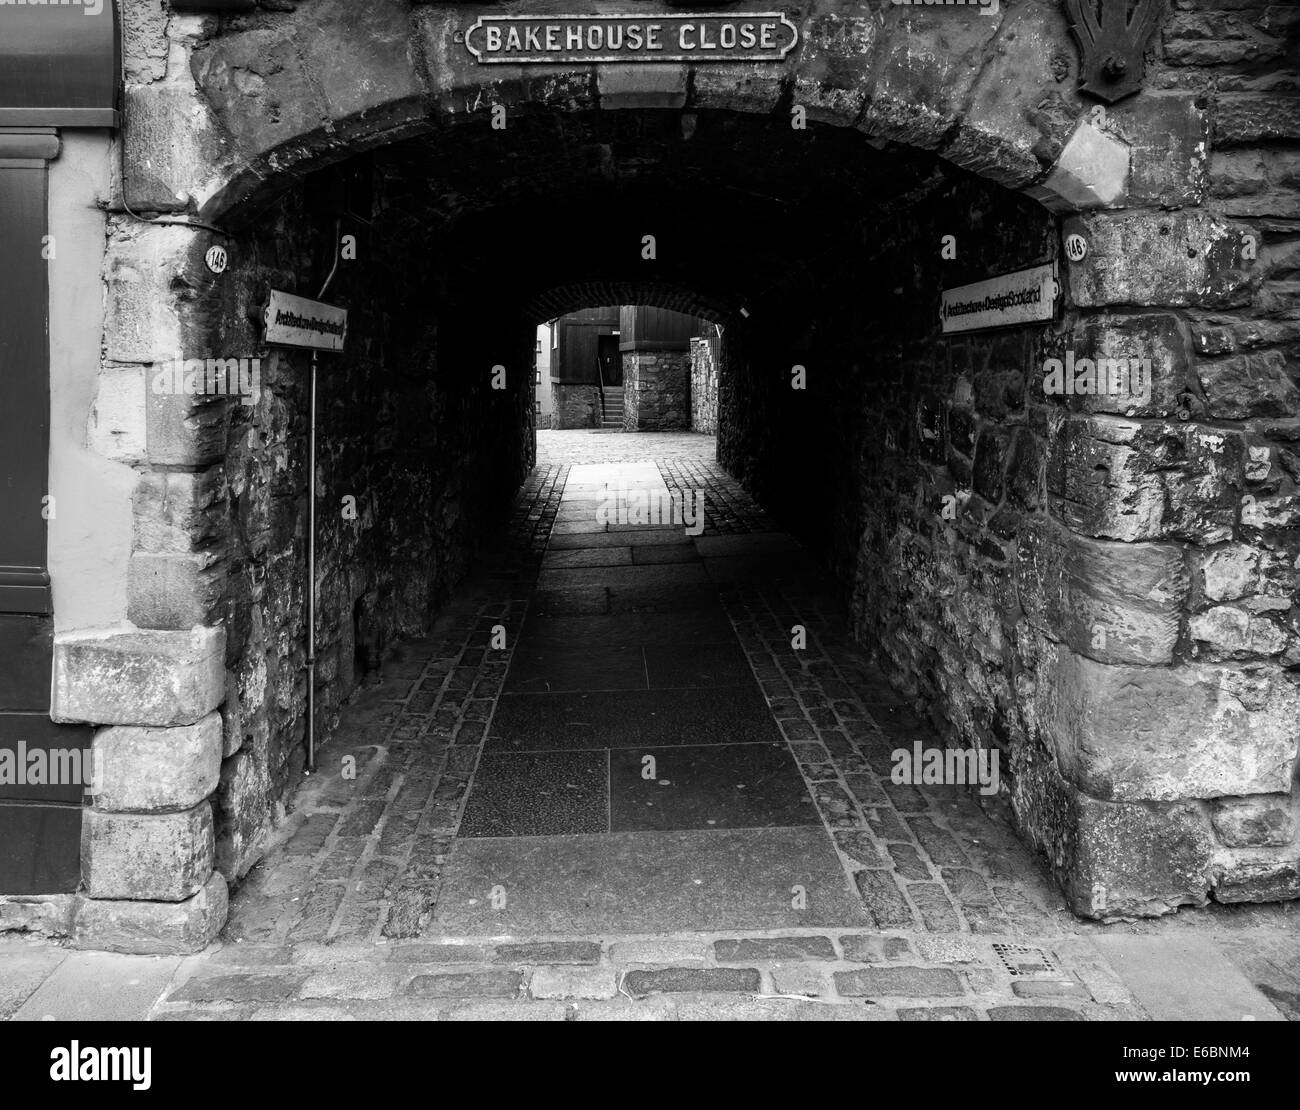 Bakehouse close Edinburgh - Stock Image